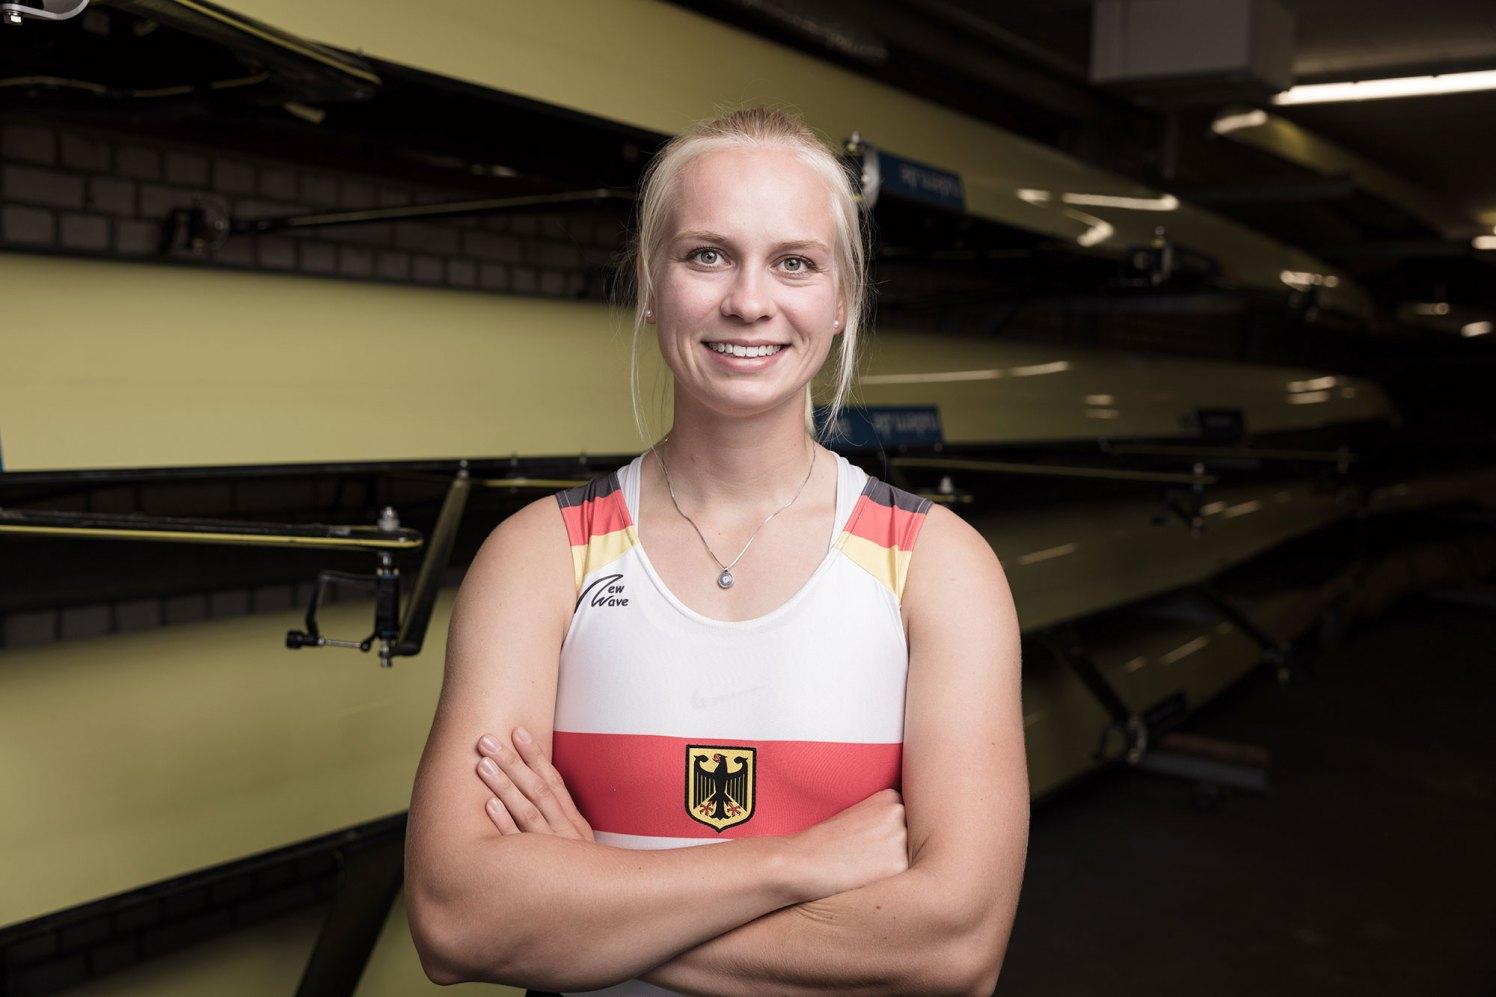 Frieda Hämmerling. Foto: DRV/Schwier